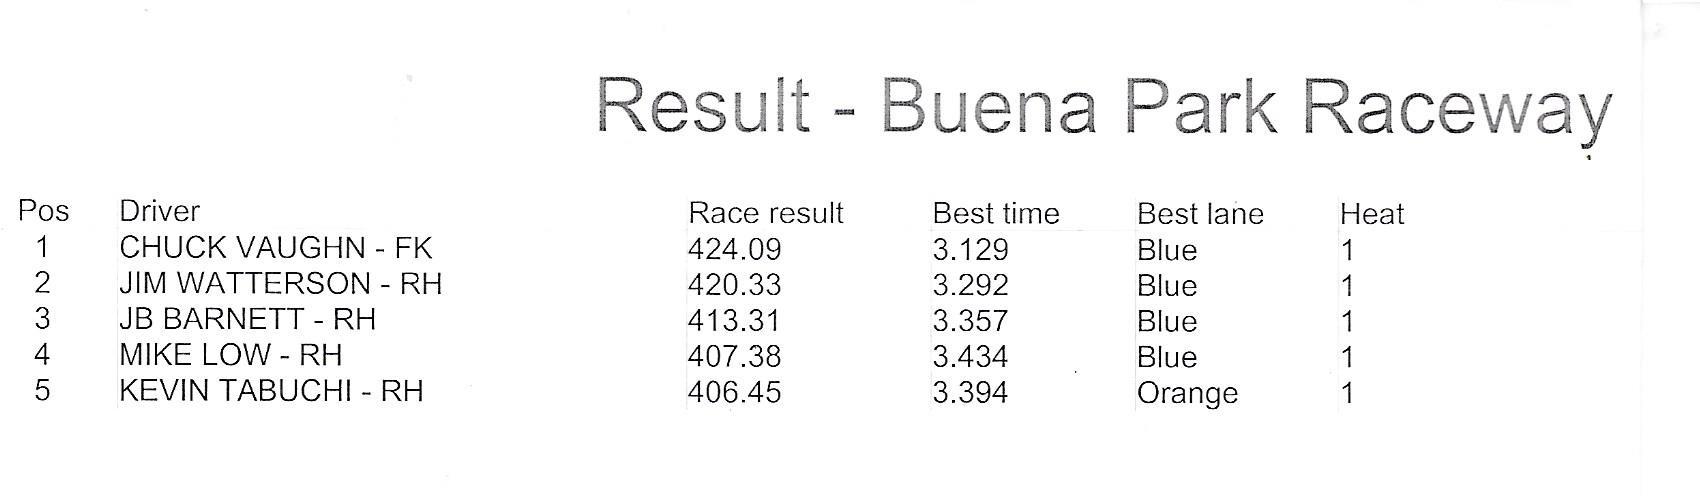 8617 HW Results.jpeg